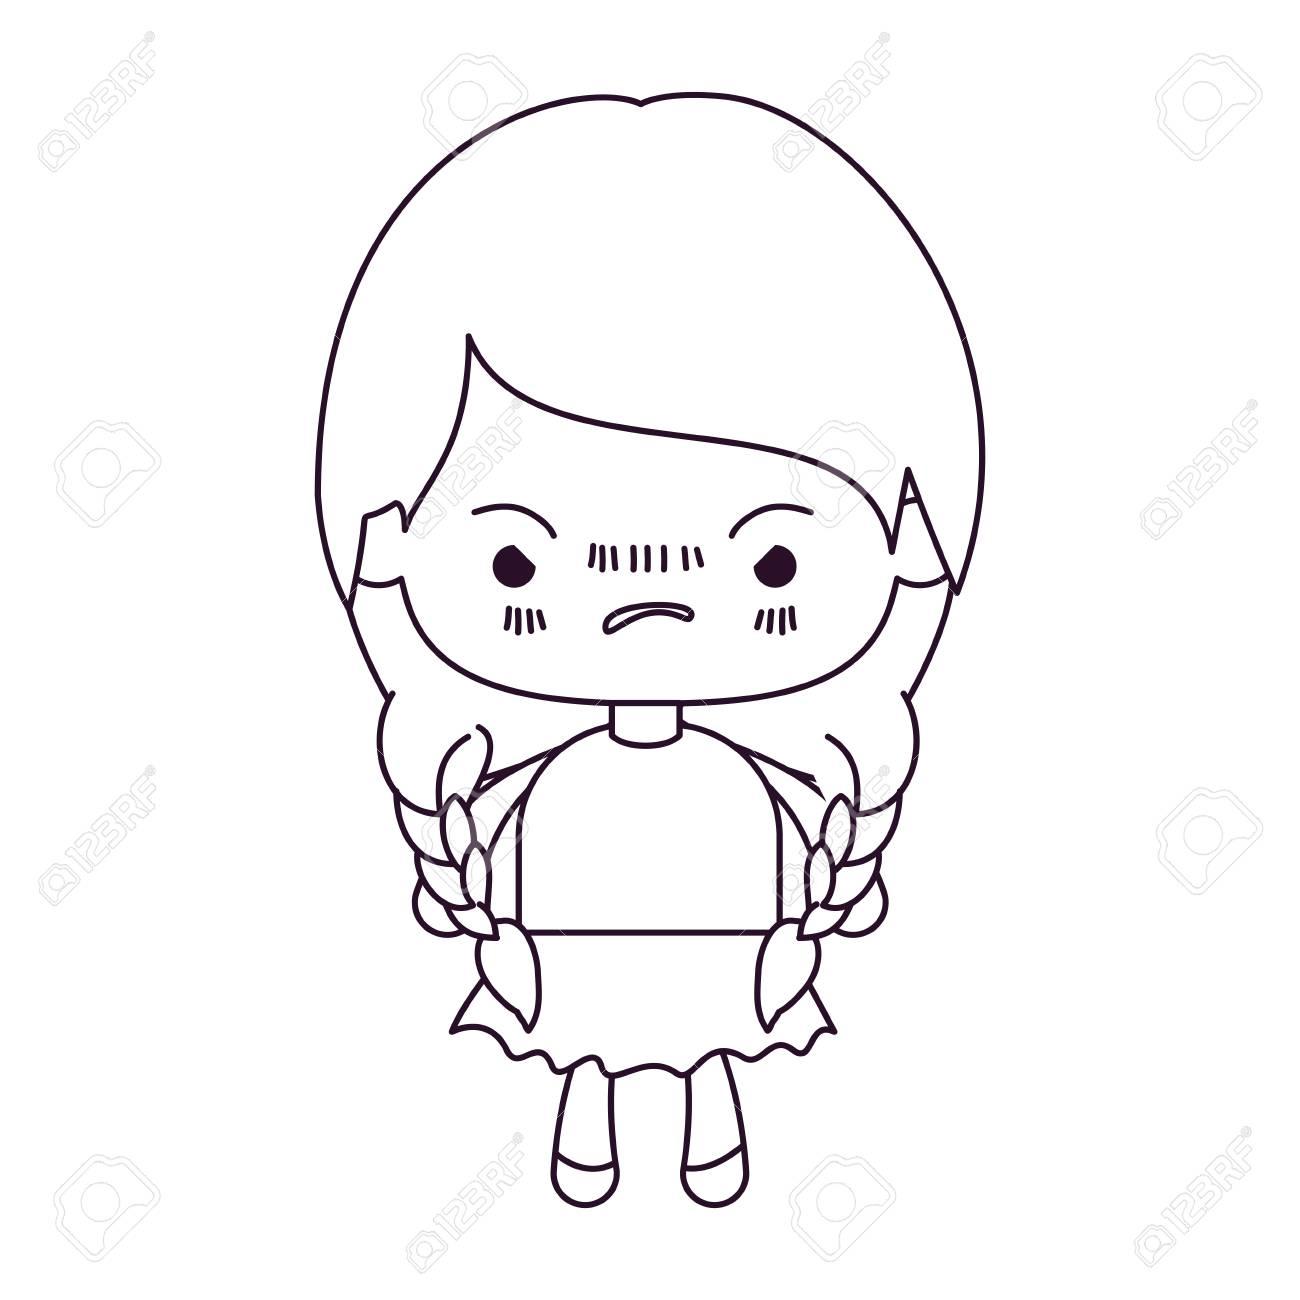 1300x1300 Monochrome Silhouette Of Kawaii Little Girl With Braided Hair